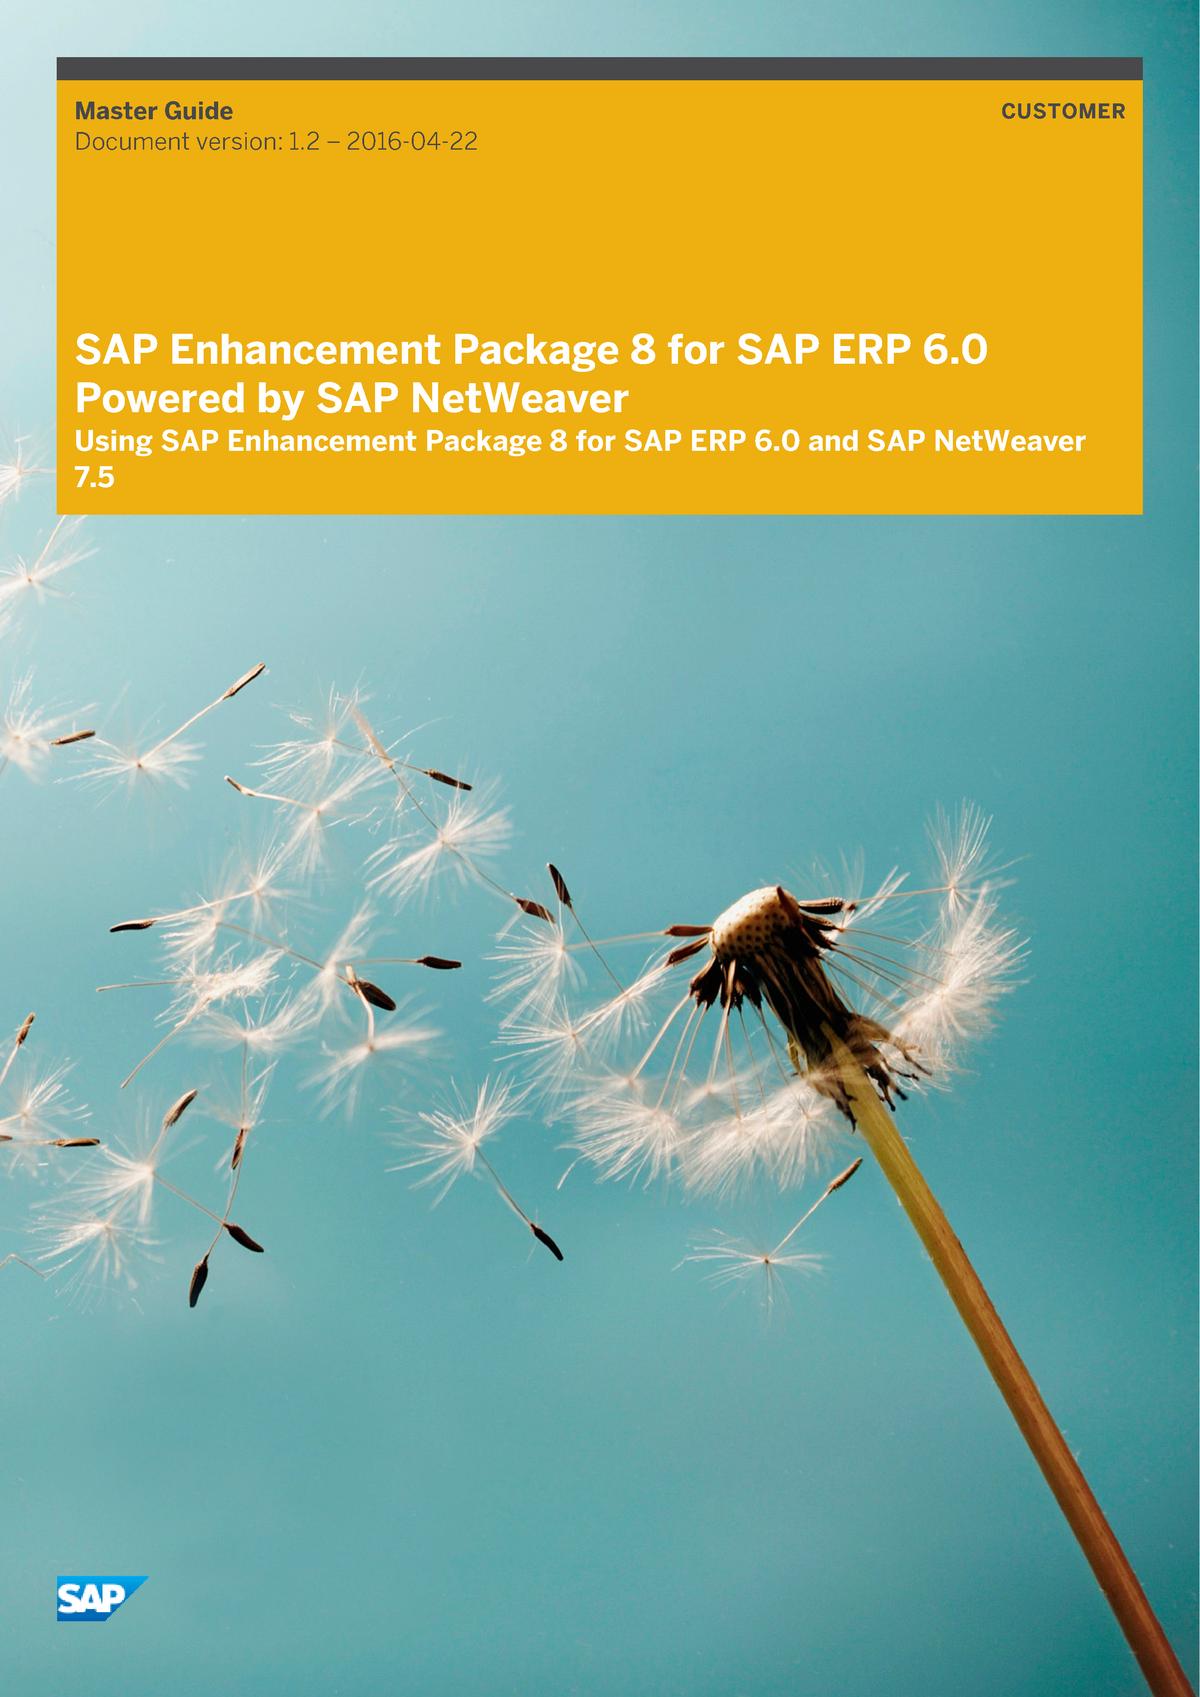 Master Guide for SAP Enhancement Package 8 for SAP ERP 60E